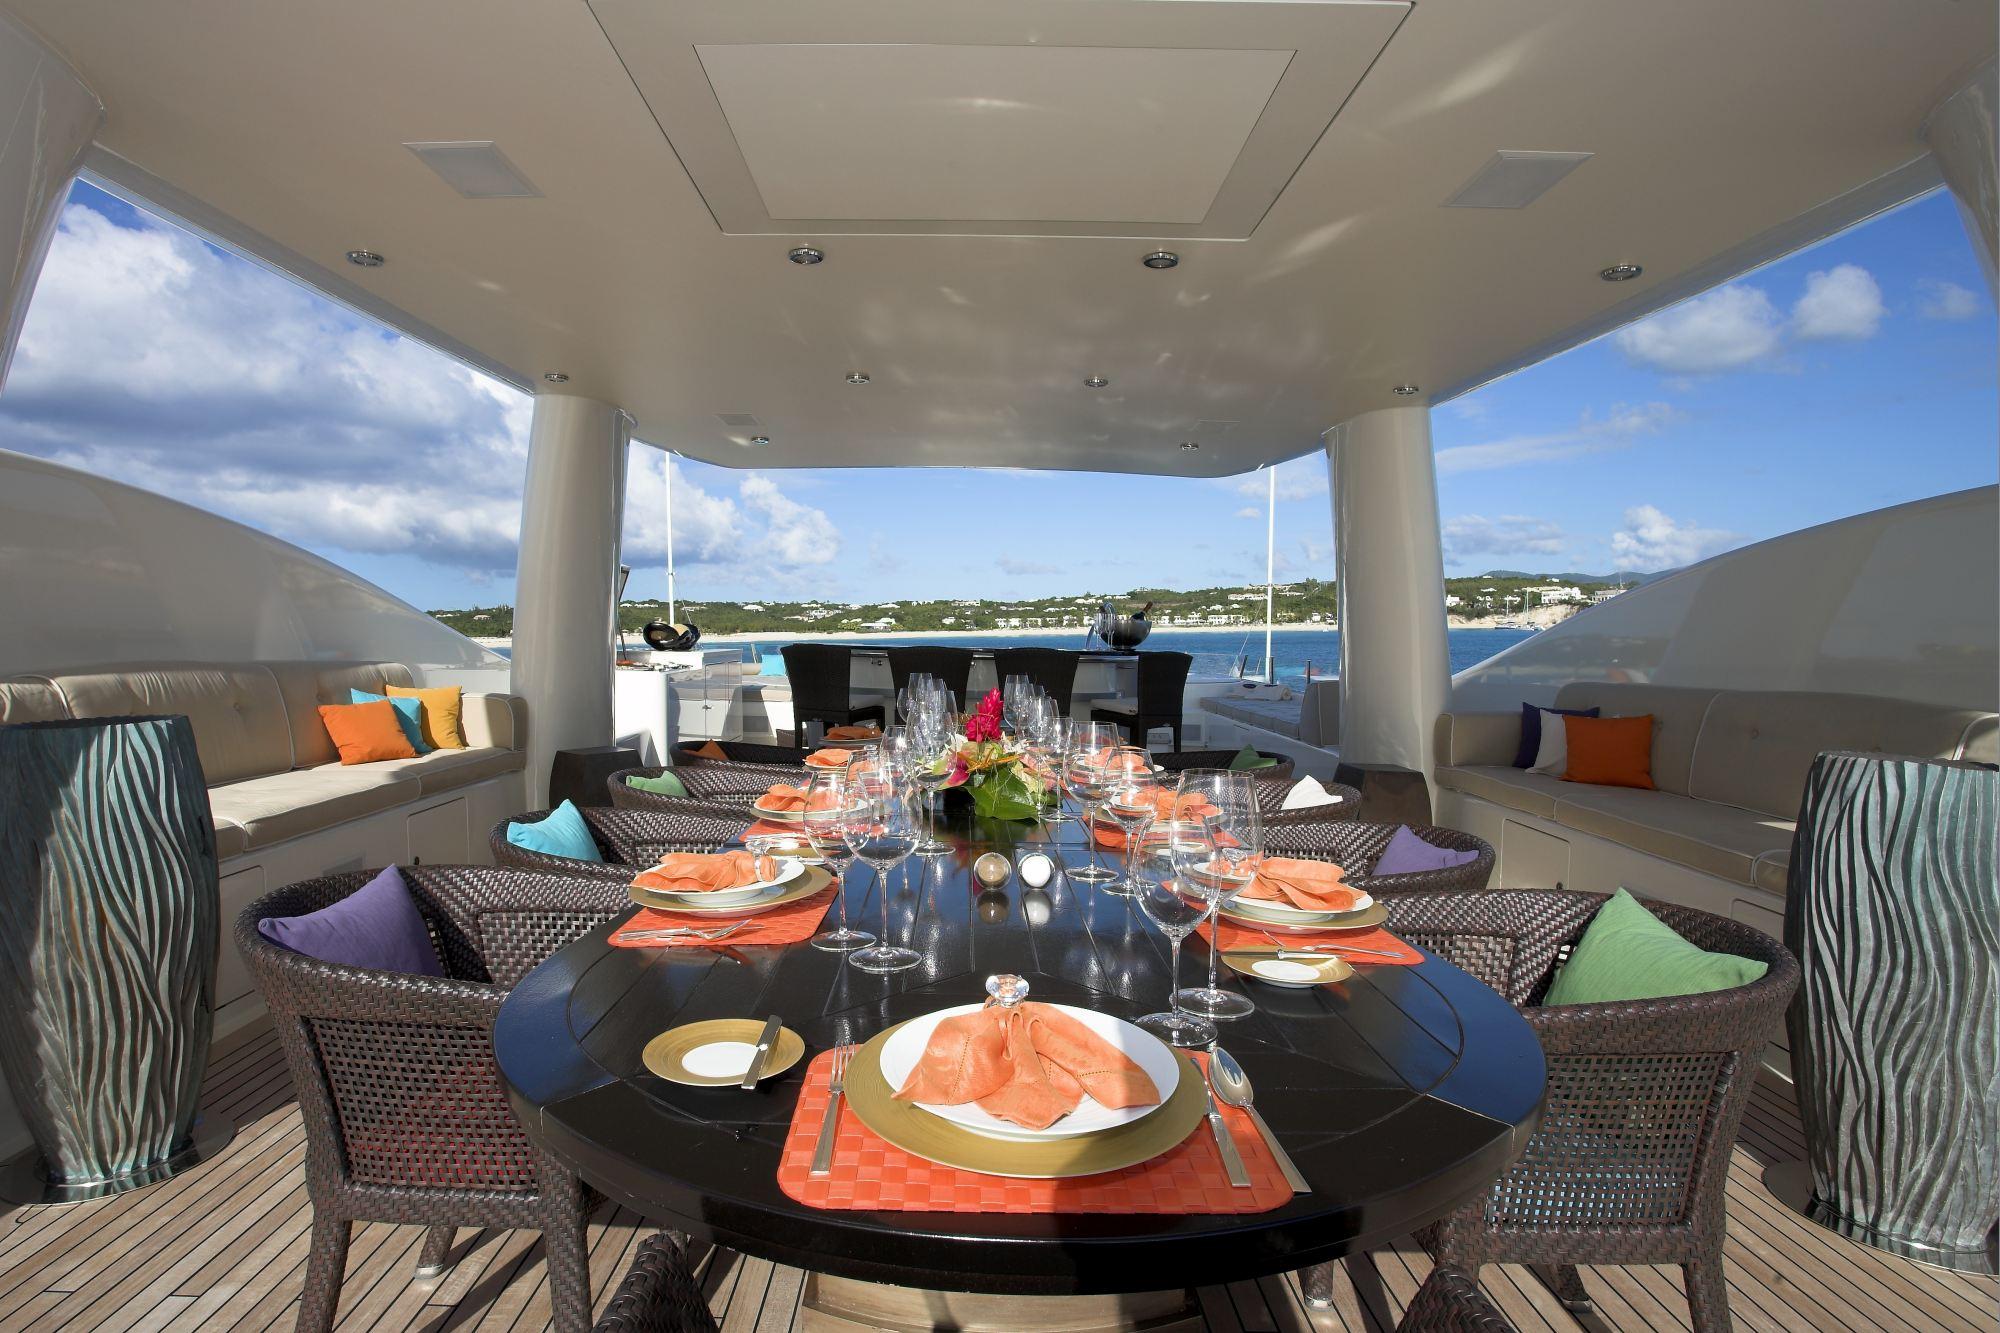 Alfresco dining on the sun deck